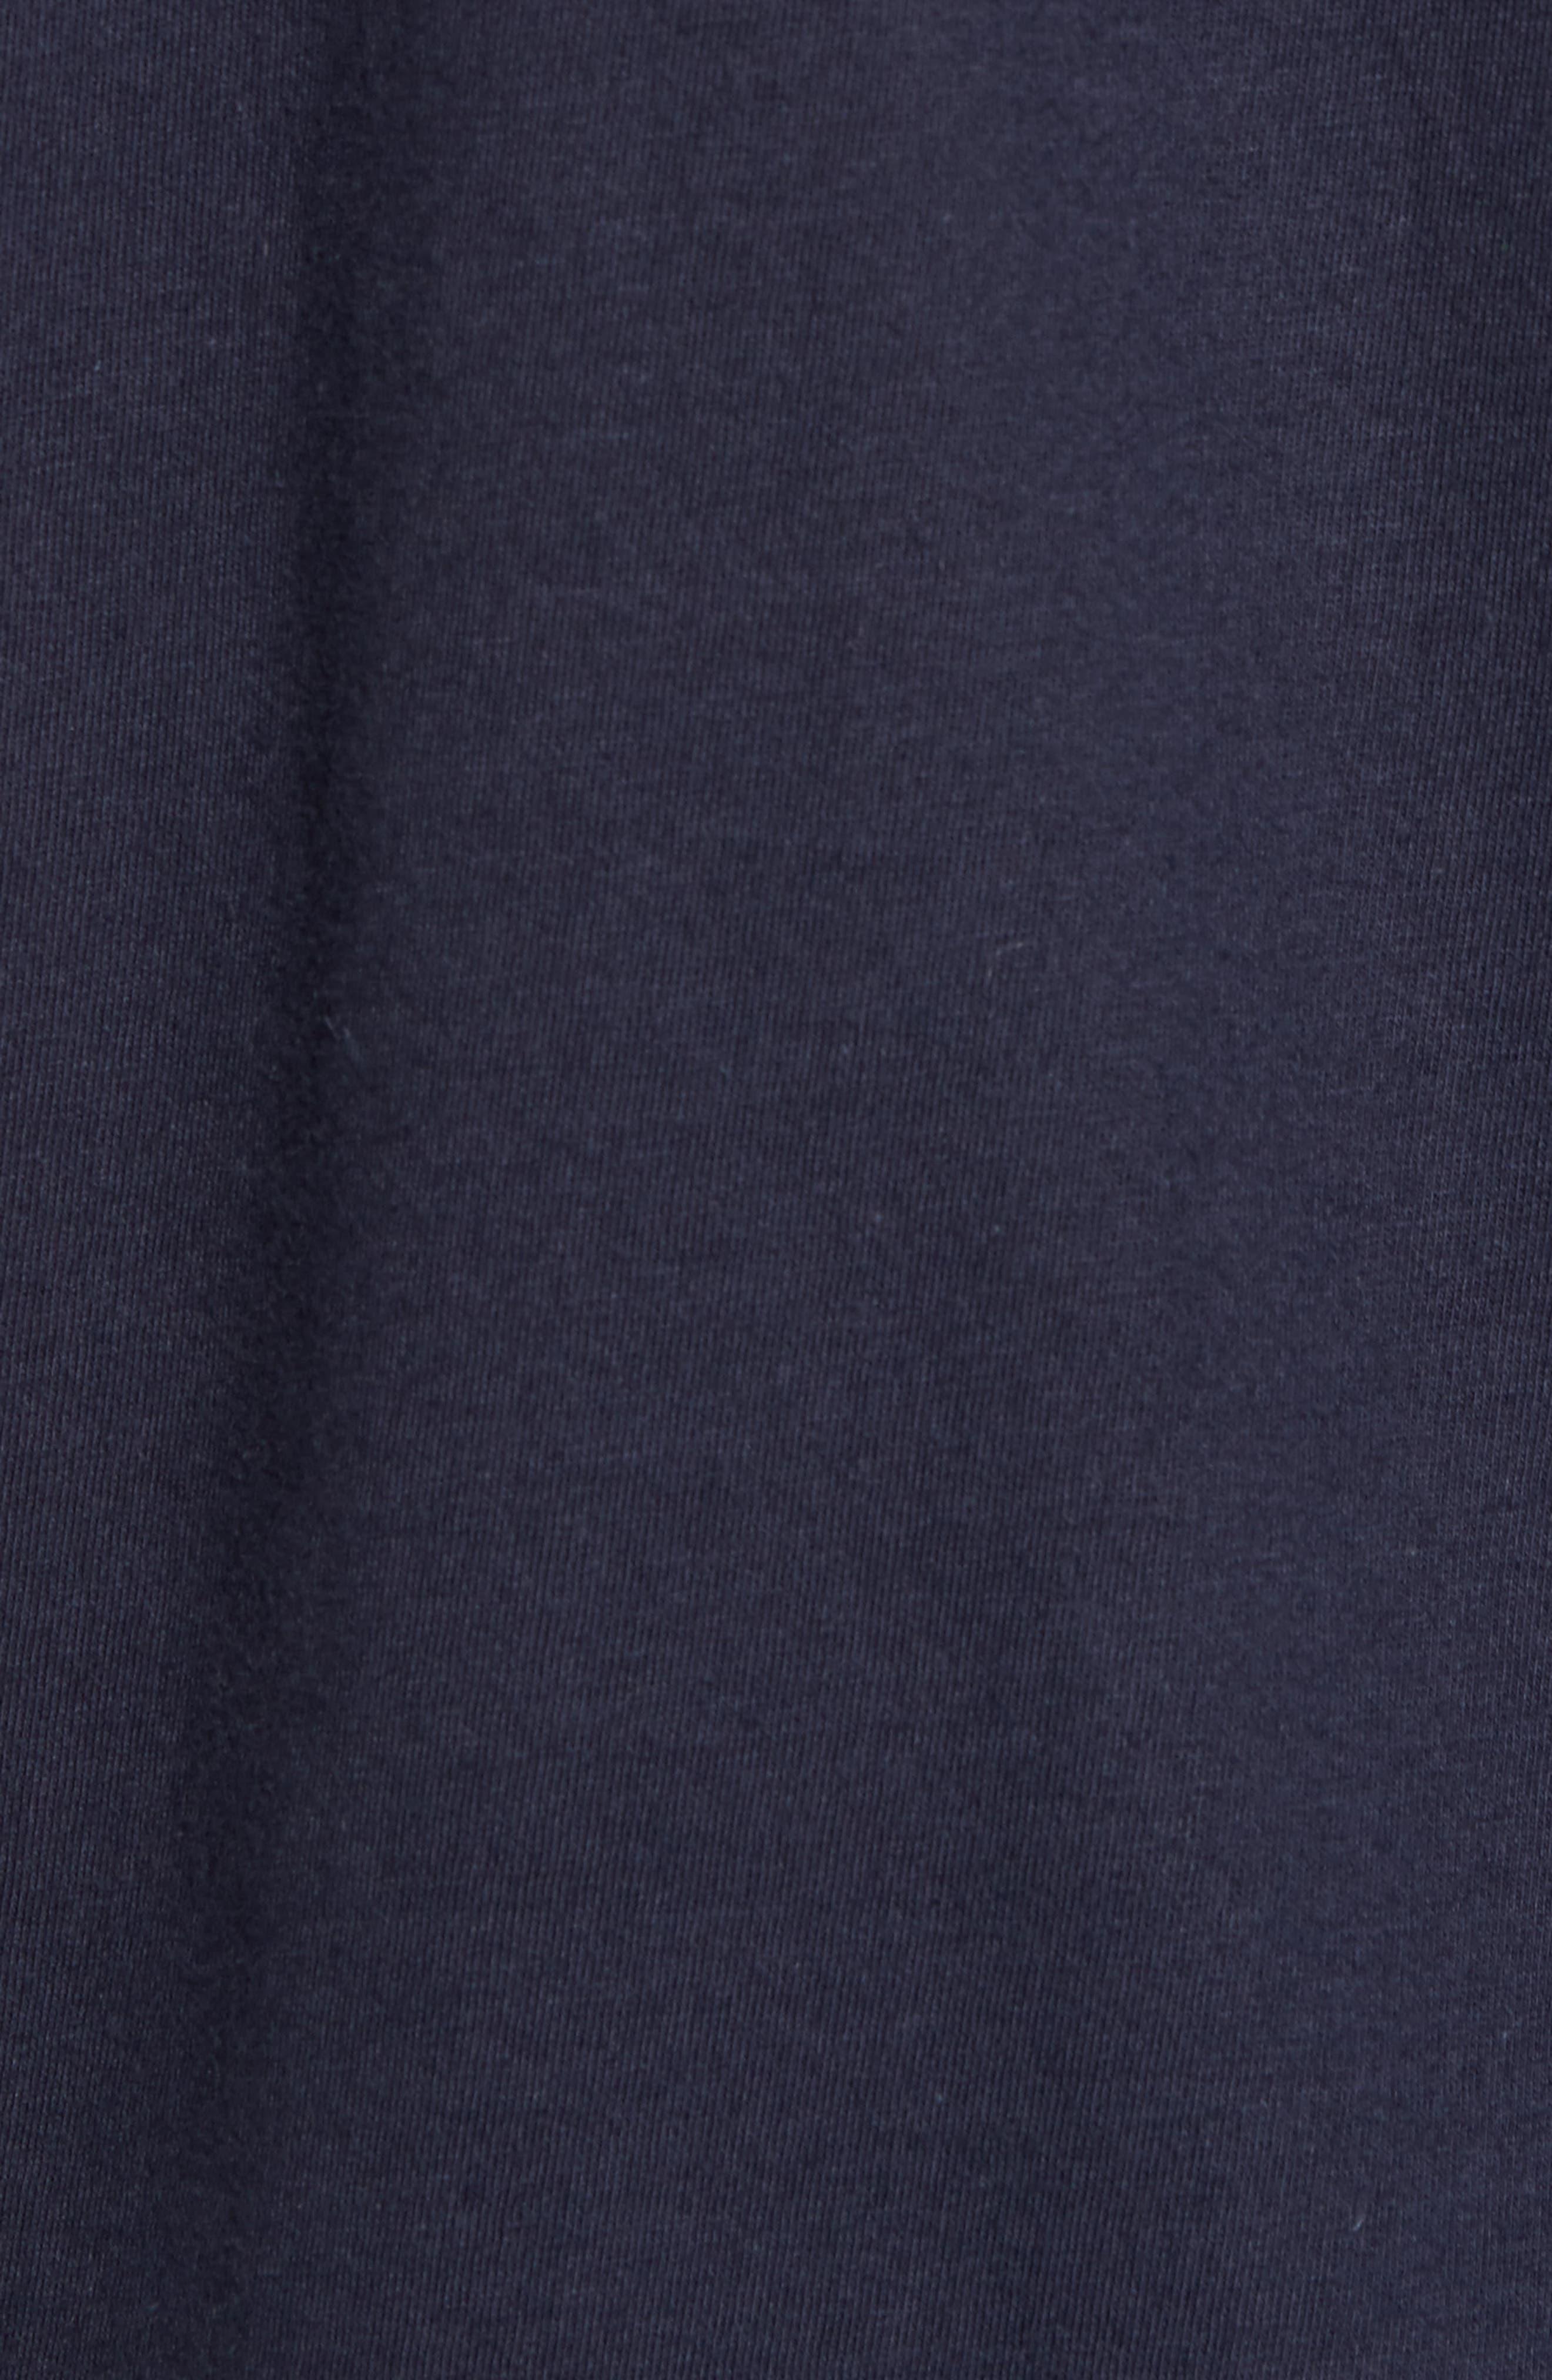 Skyline Arch 3D Graphic T-Shirt,                             Alternate thumbnail 5, color,                             Navy